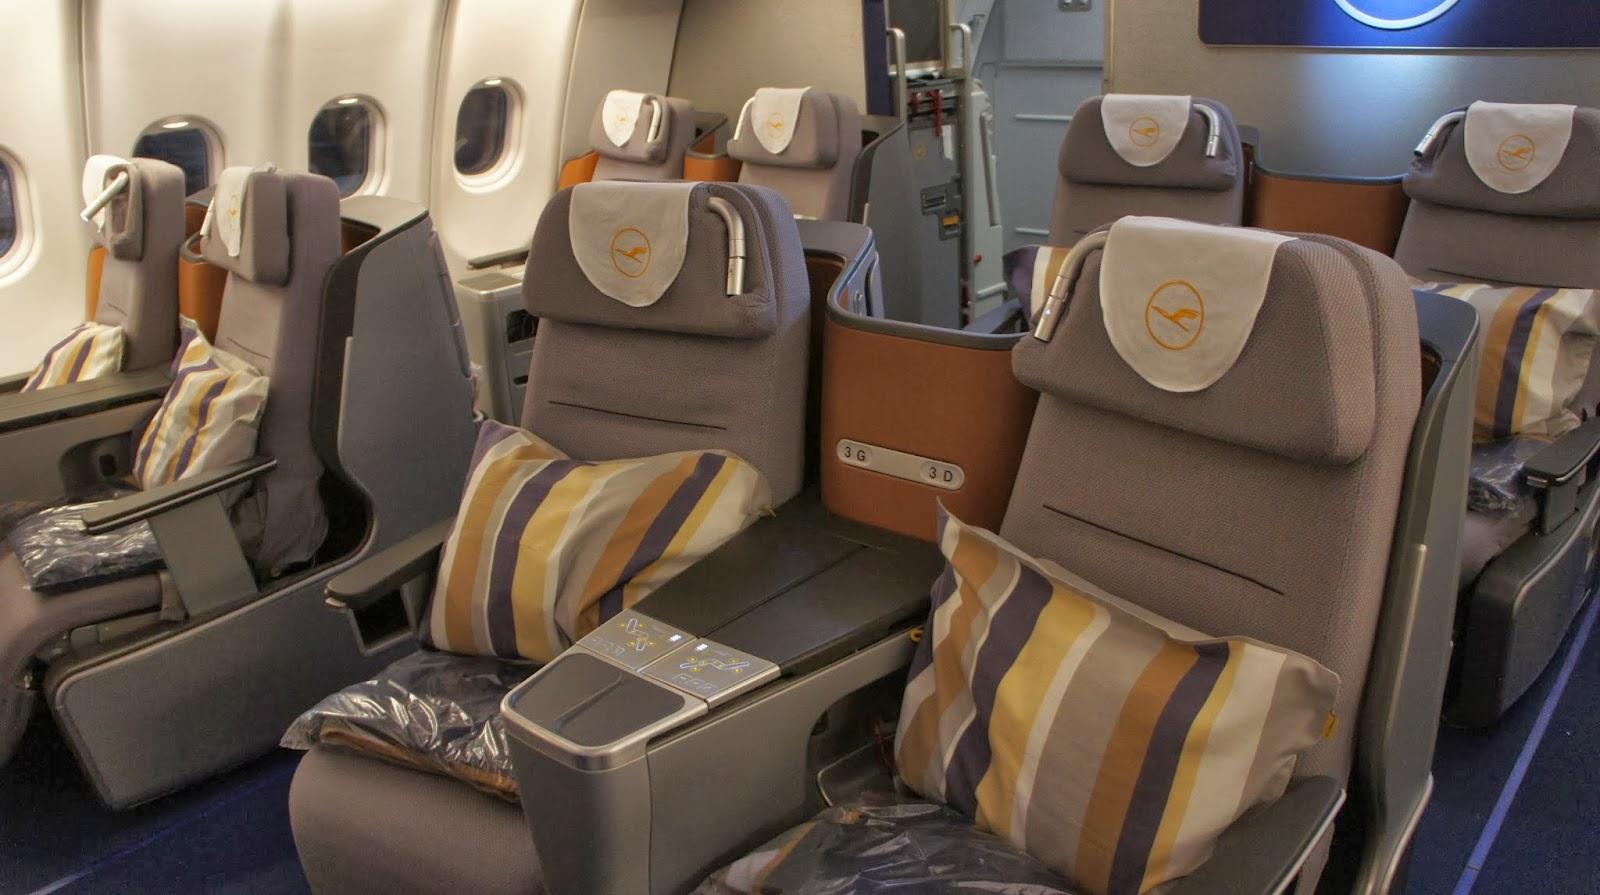 hotelholic: 德航紐約-慕尼黑商務艙(Lufthansa Business Class: New York JFK-Munich)